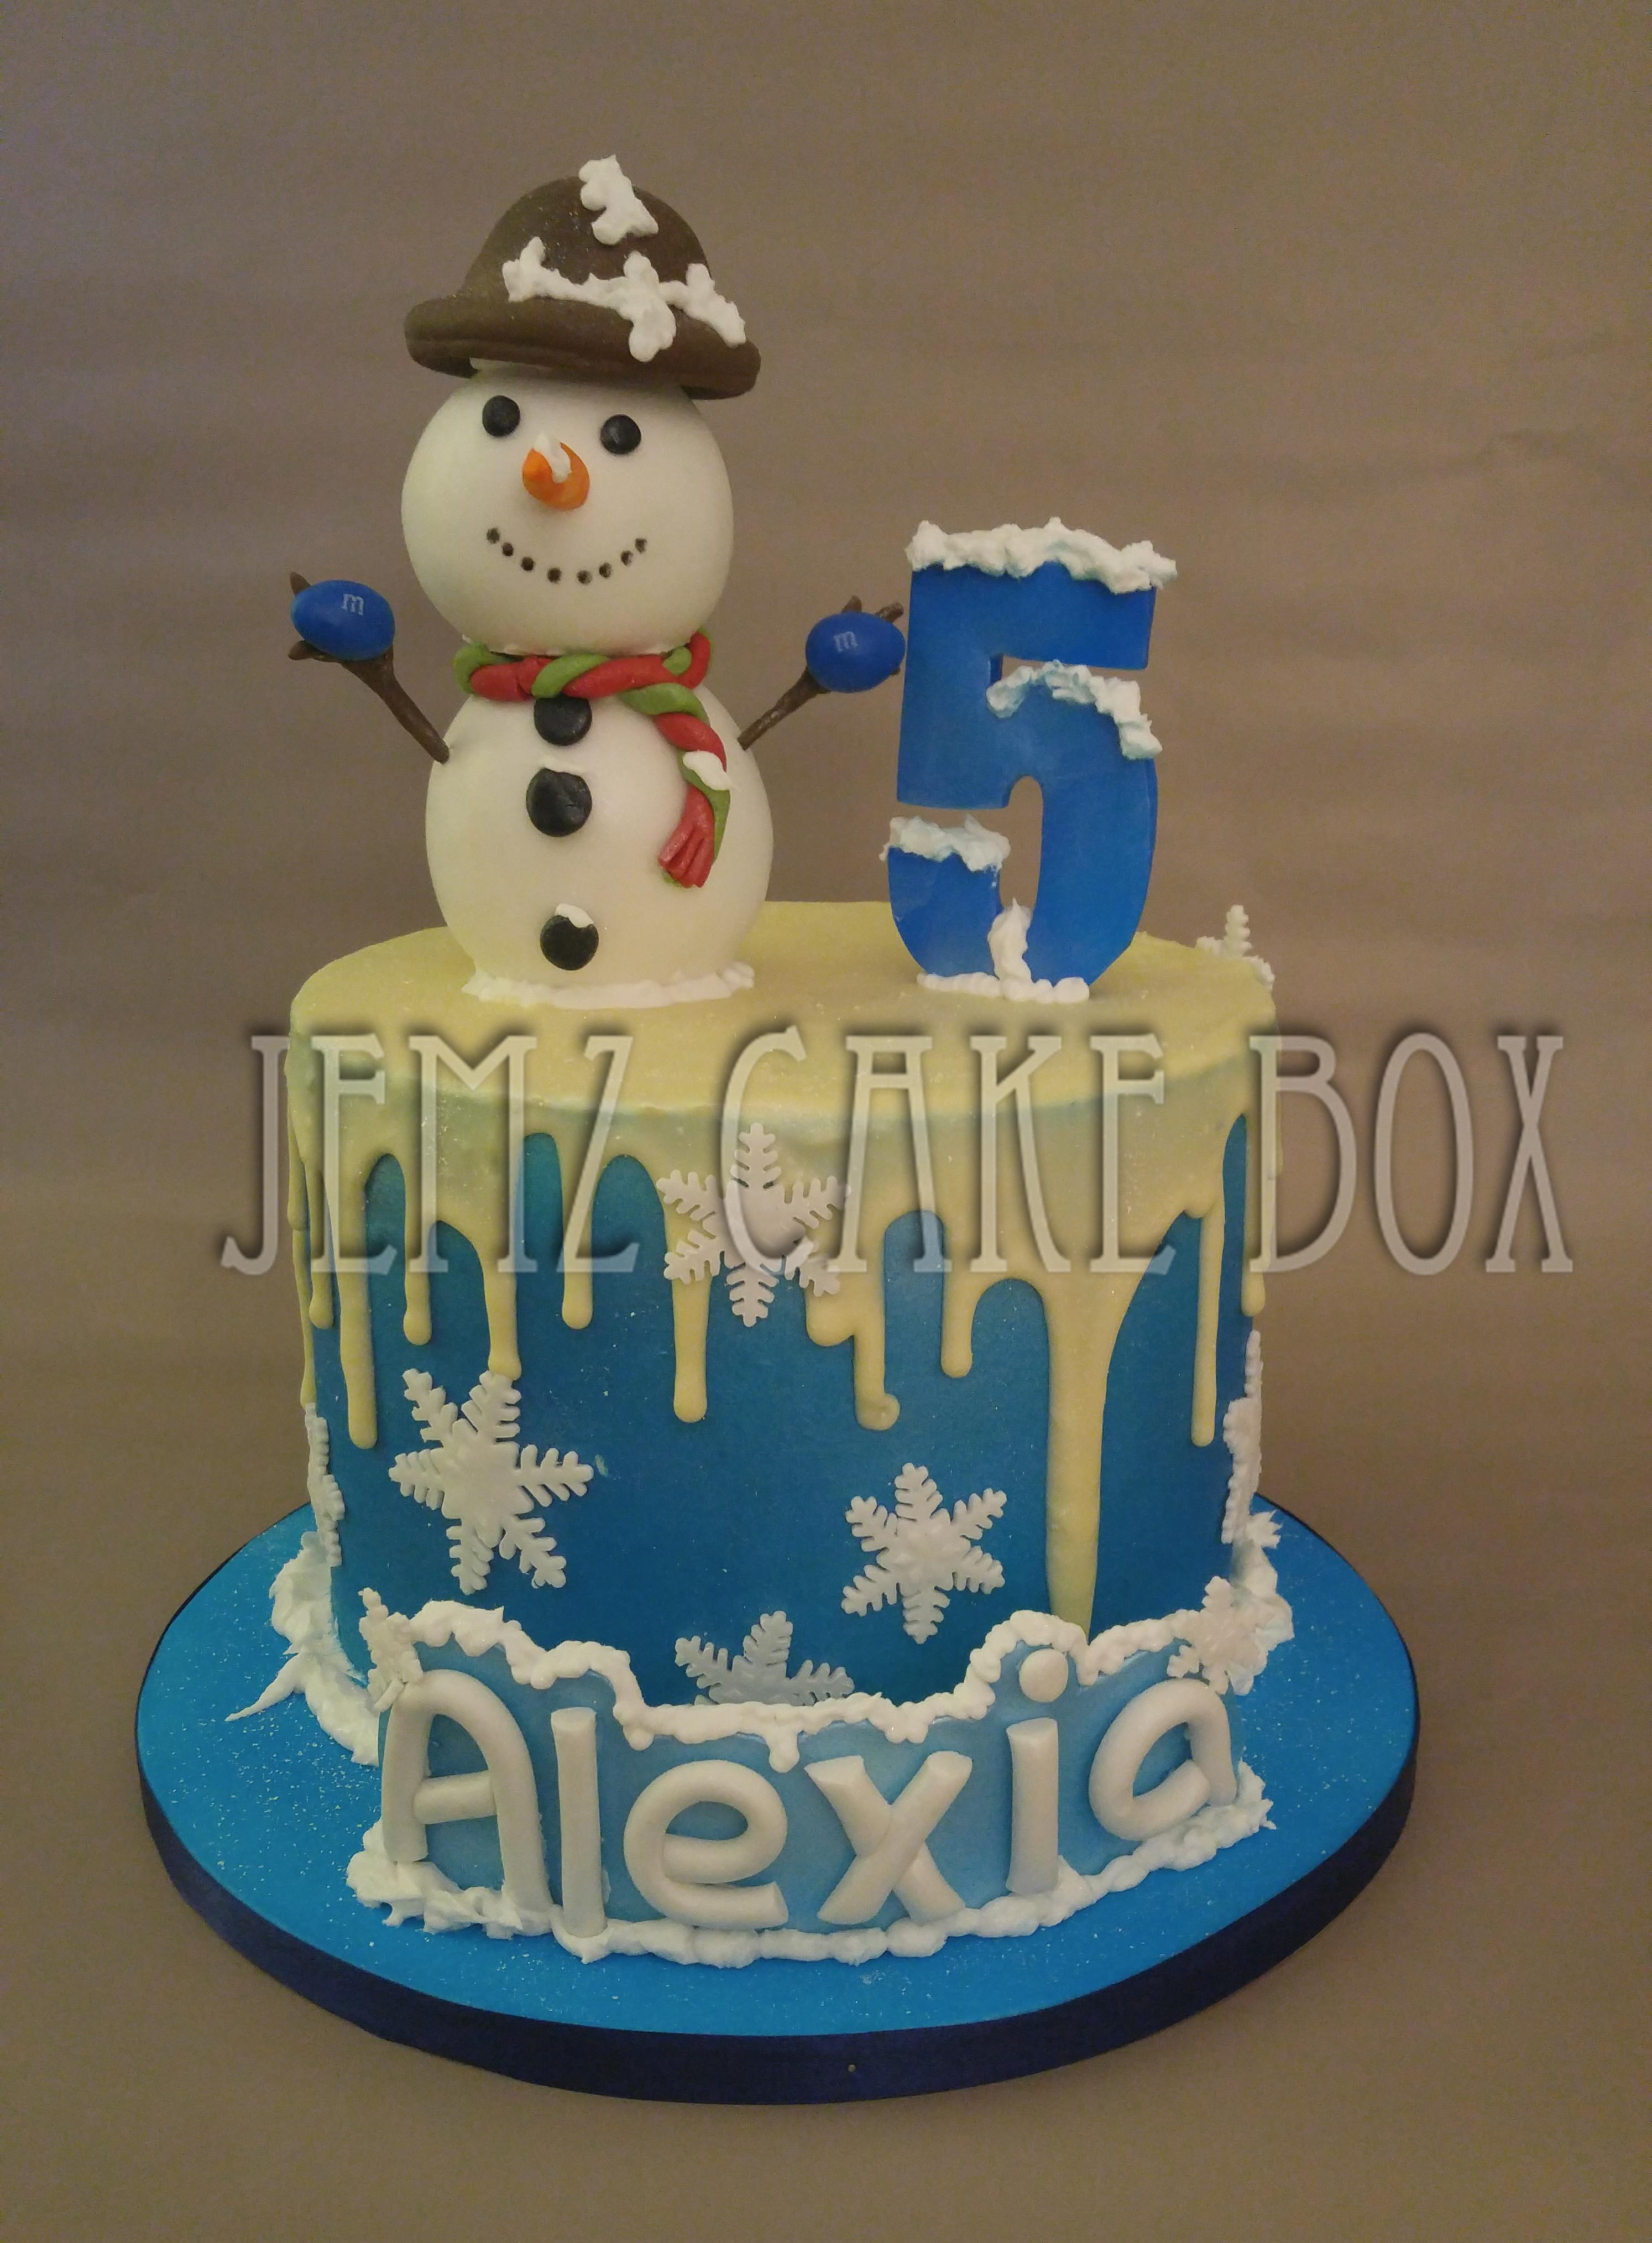 Celebration Cakes Jemz Cake Box